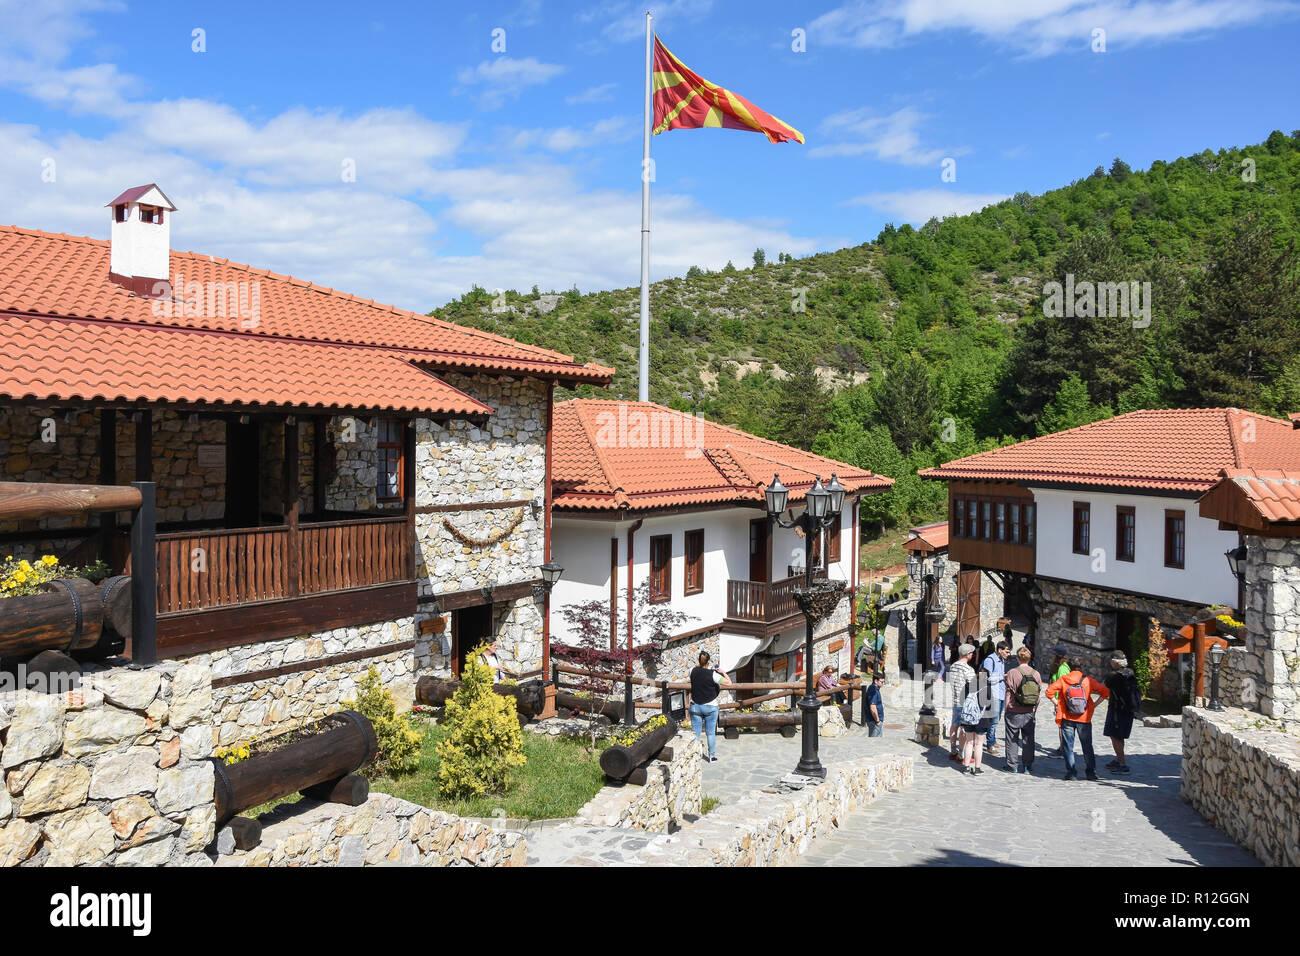 Traditional houses, Macedonian Village Resort, Gorno Nerezi, Skopje, Skopje Region, Republic of Macedonia - Stock Image